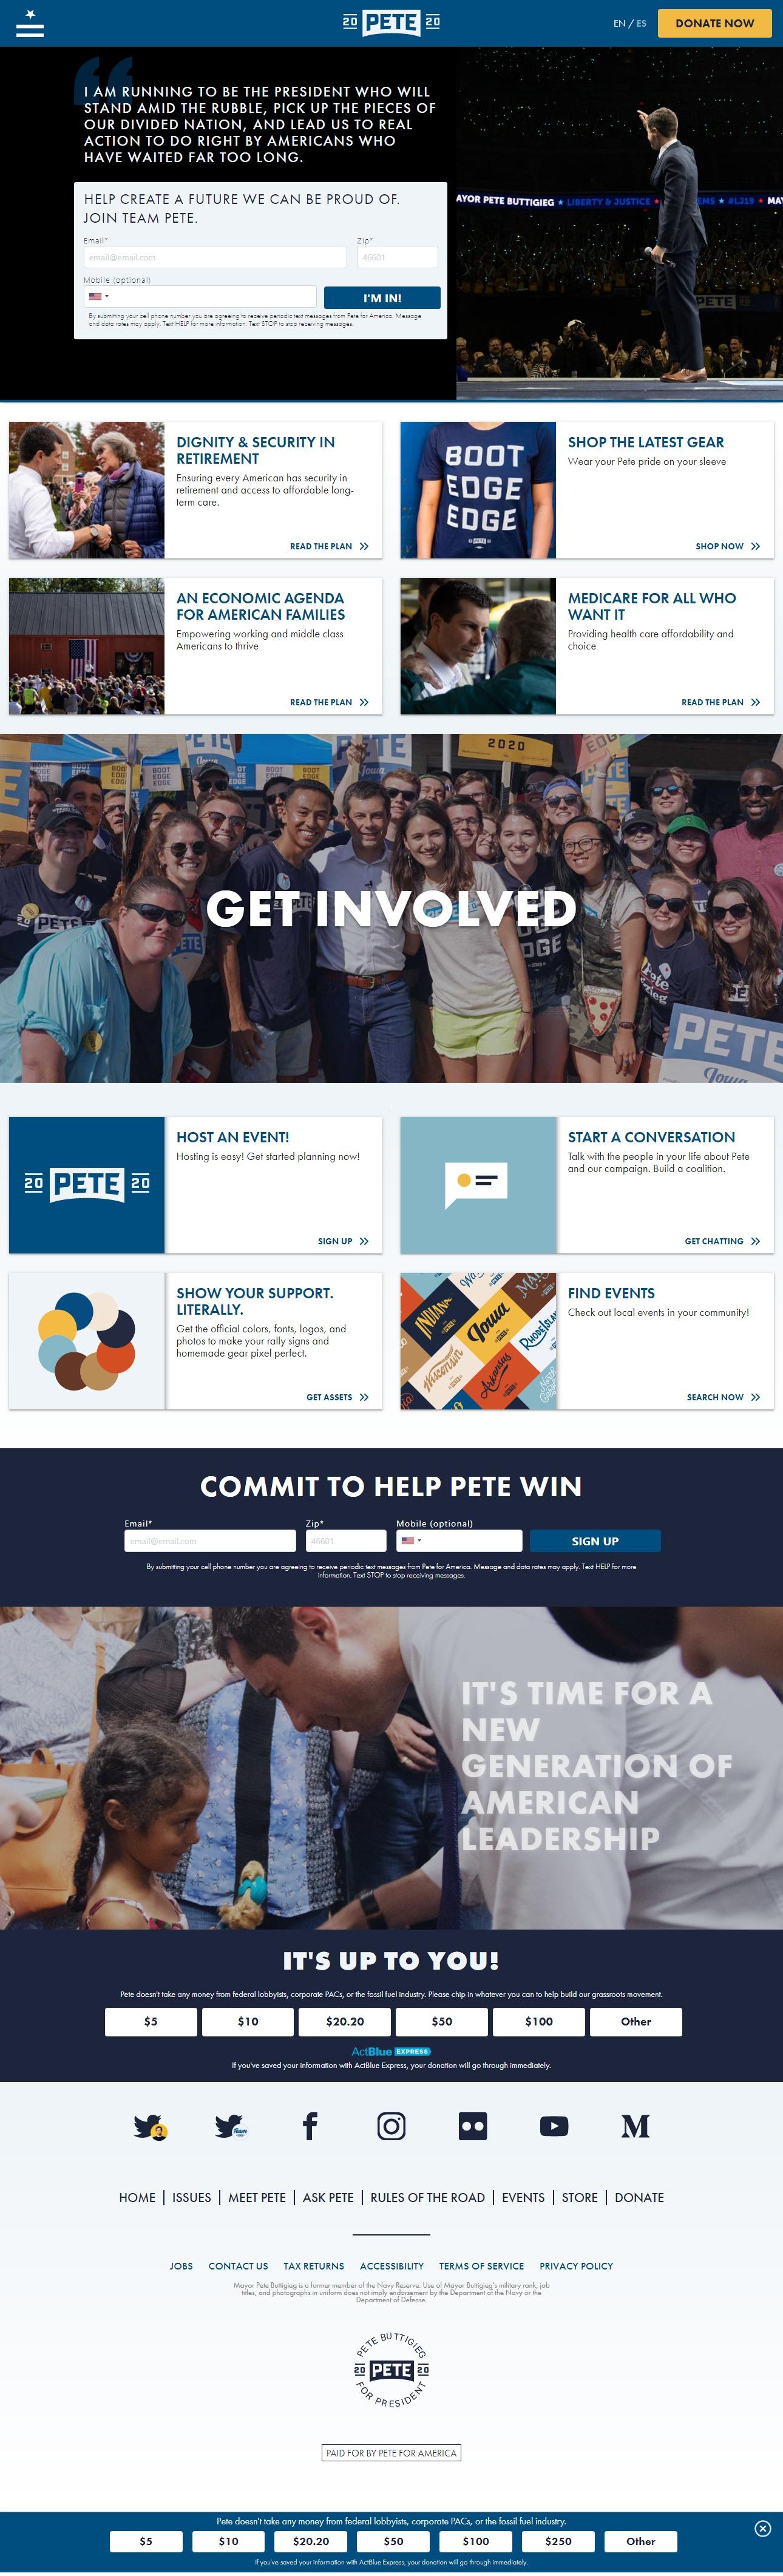 Homepage Snapshot for December 1, 2019: Mayor Pete Buttigieg